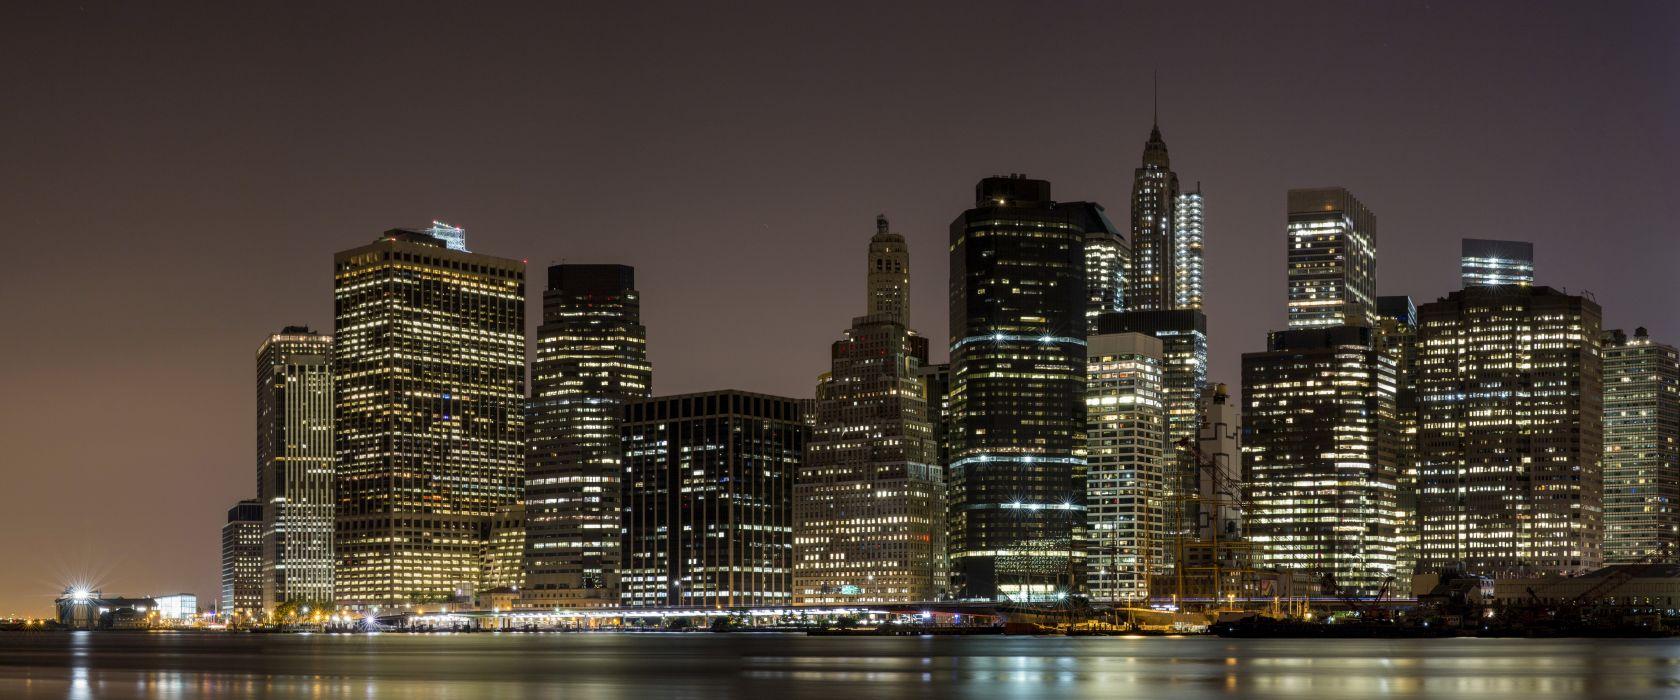 Skyscrapers Manhattan New York City Night Cities wallpaper